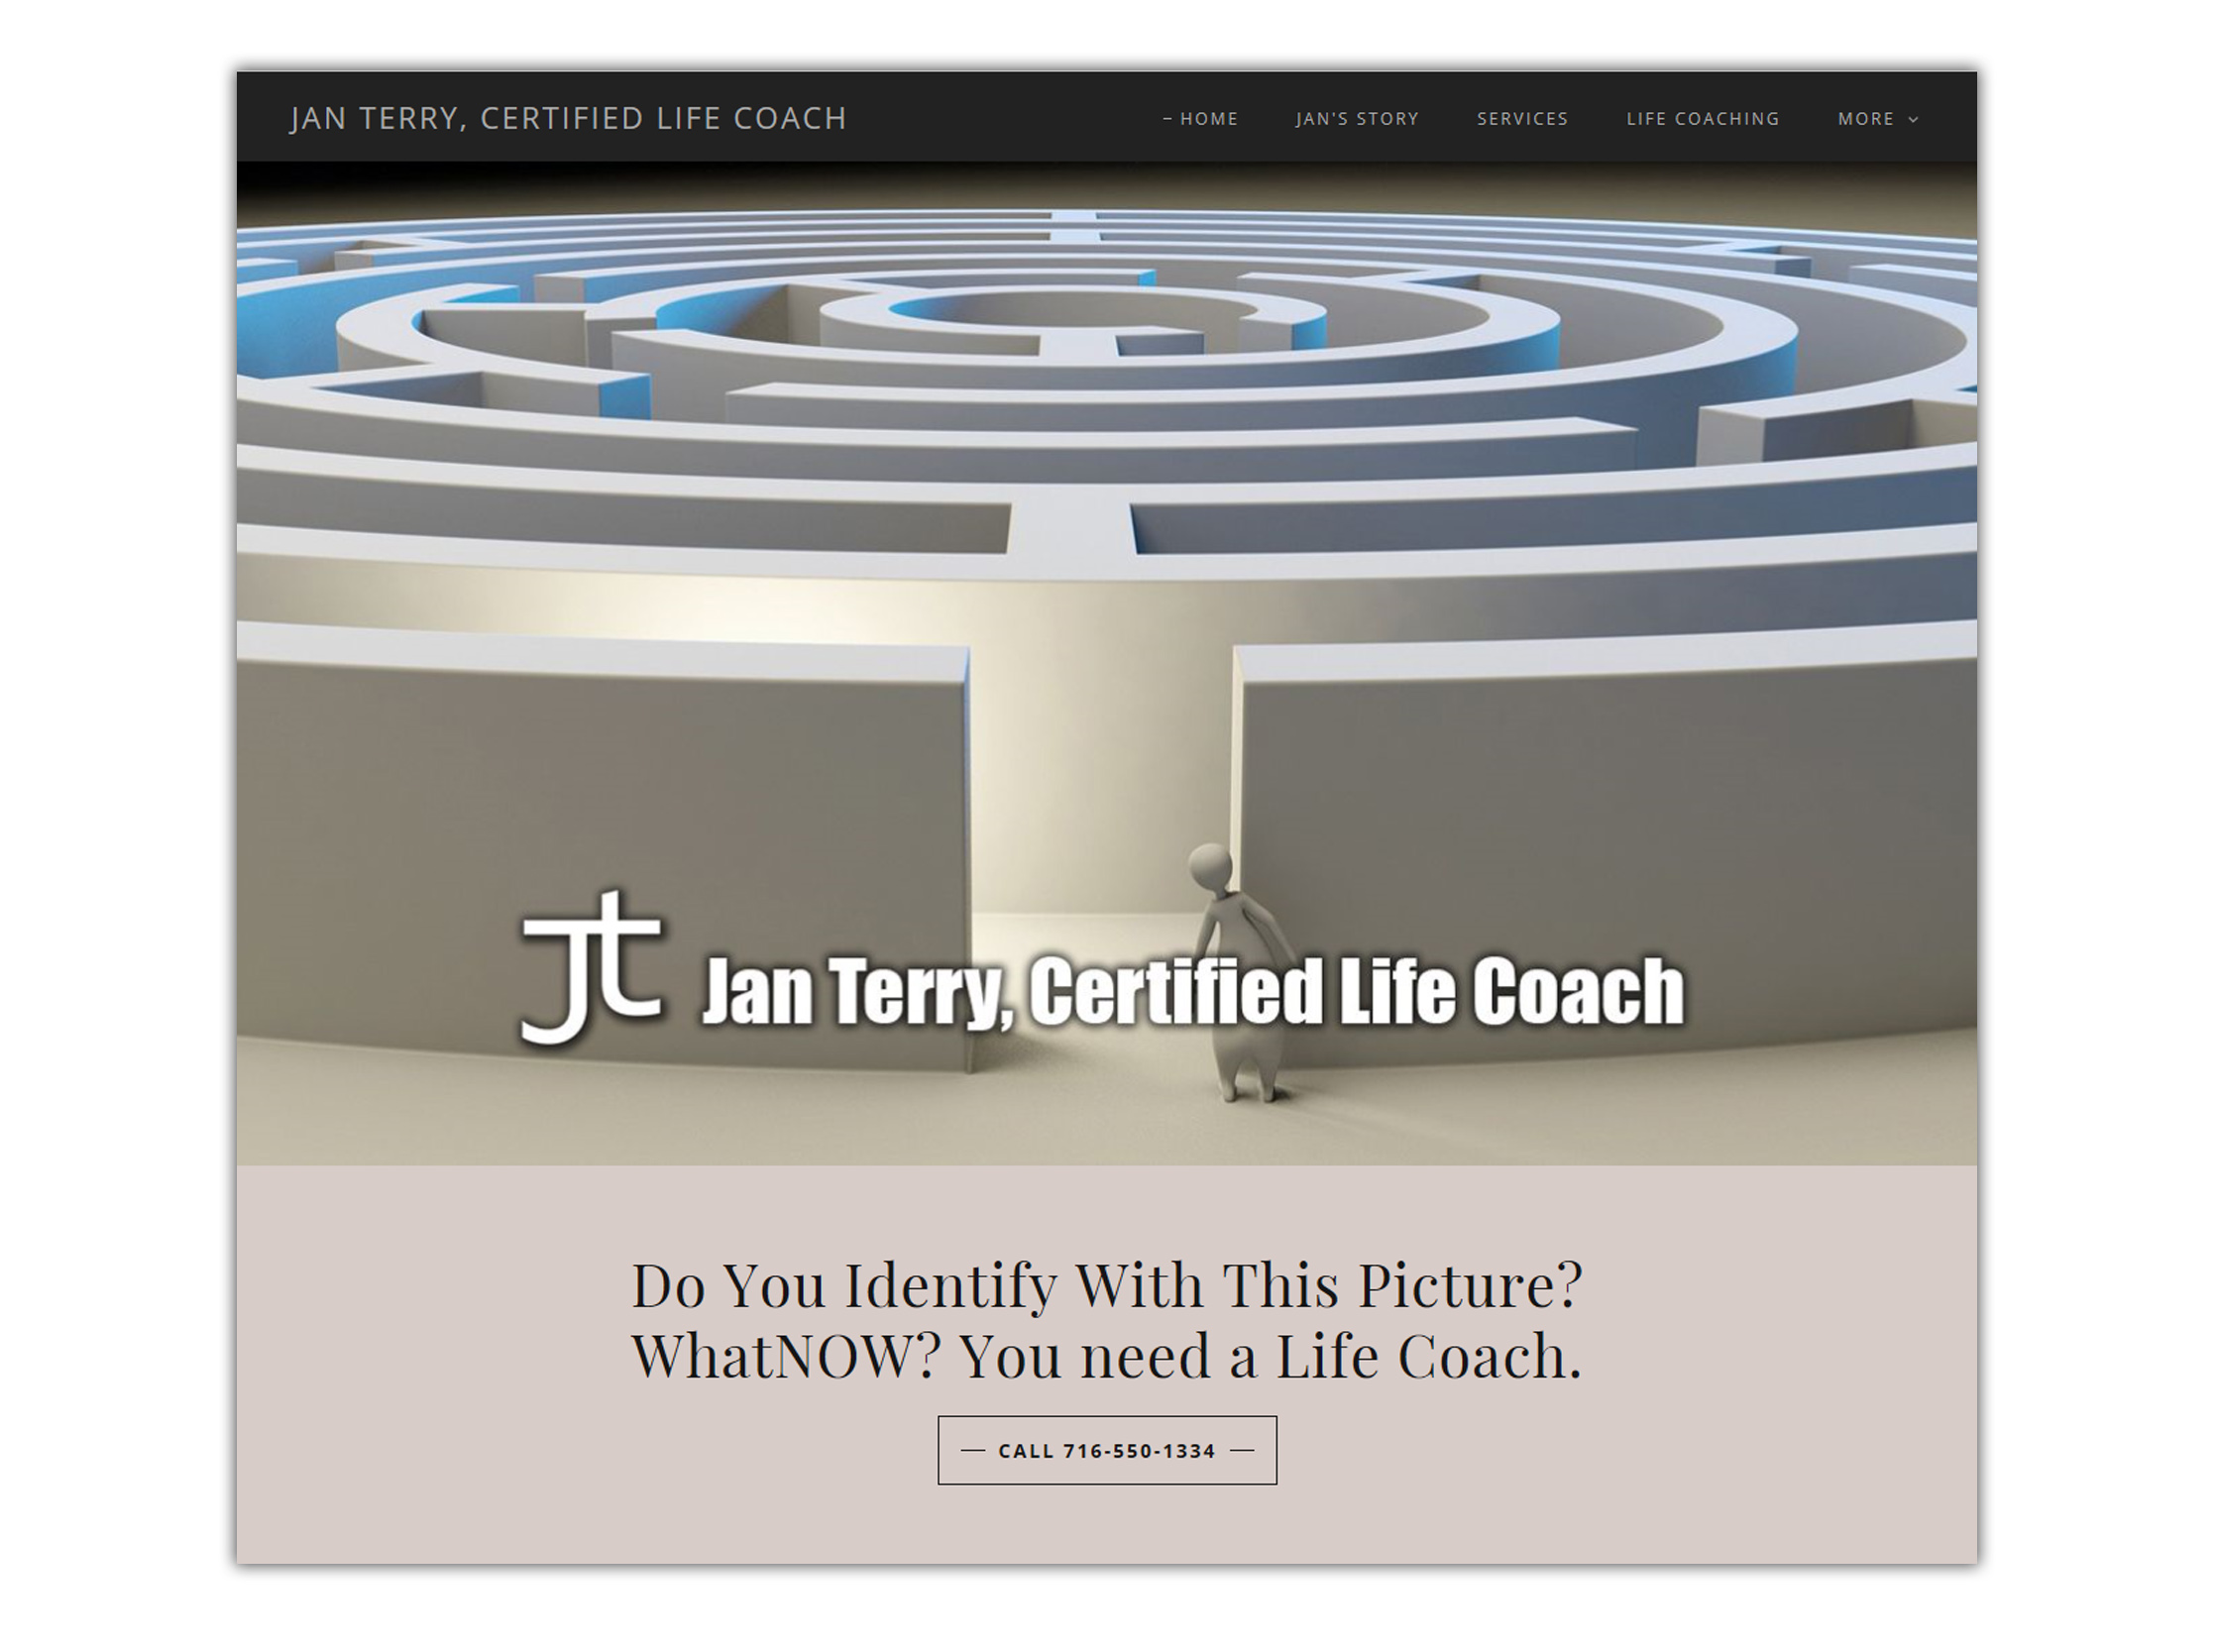 Jan Terry